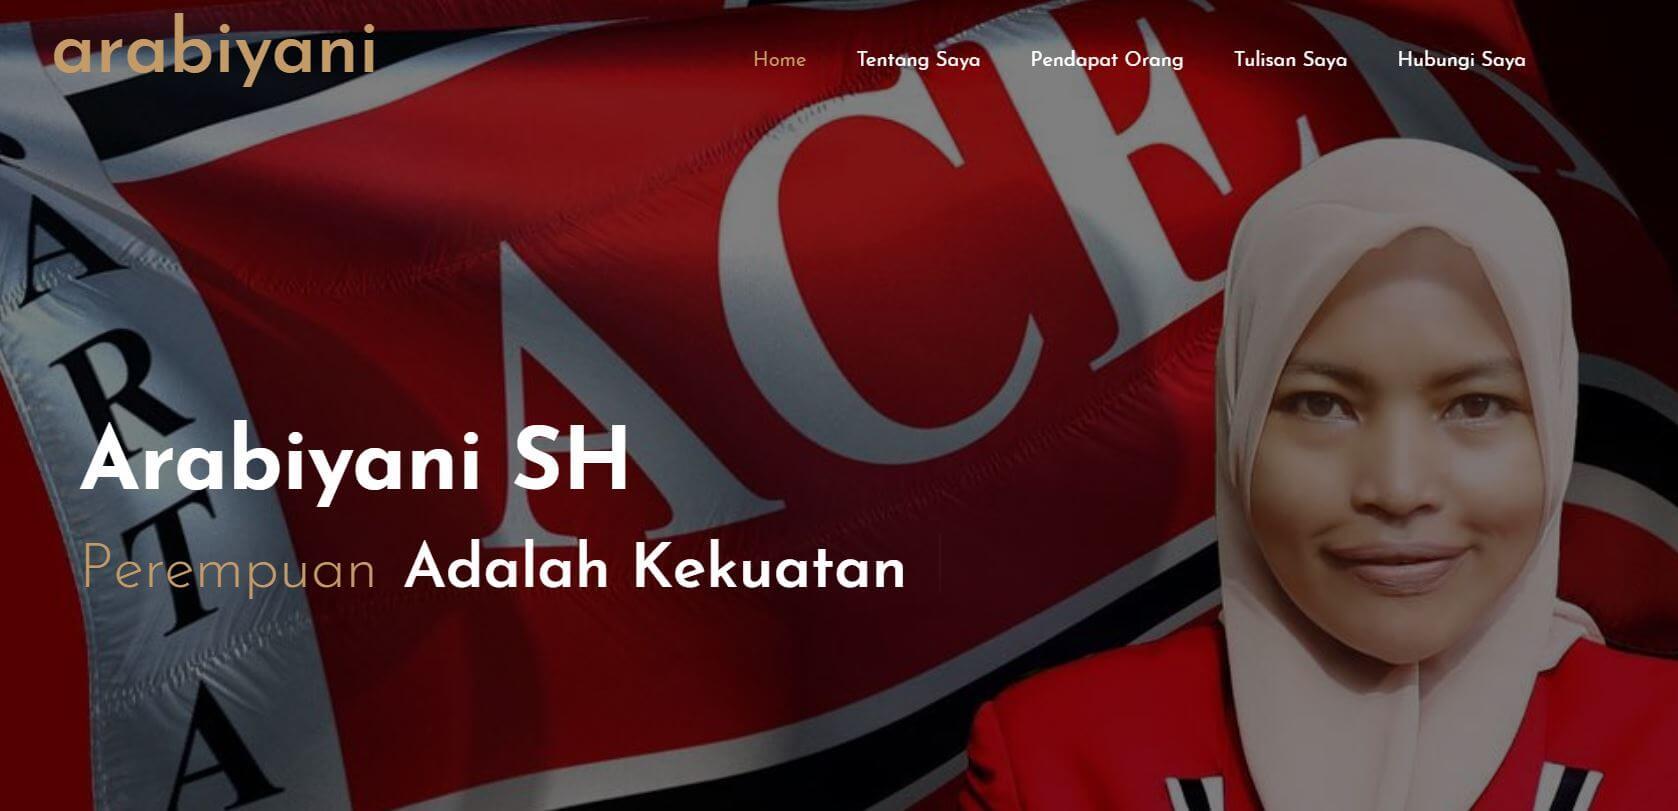 arabiyani website